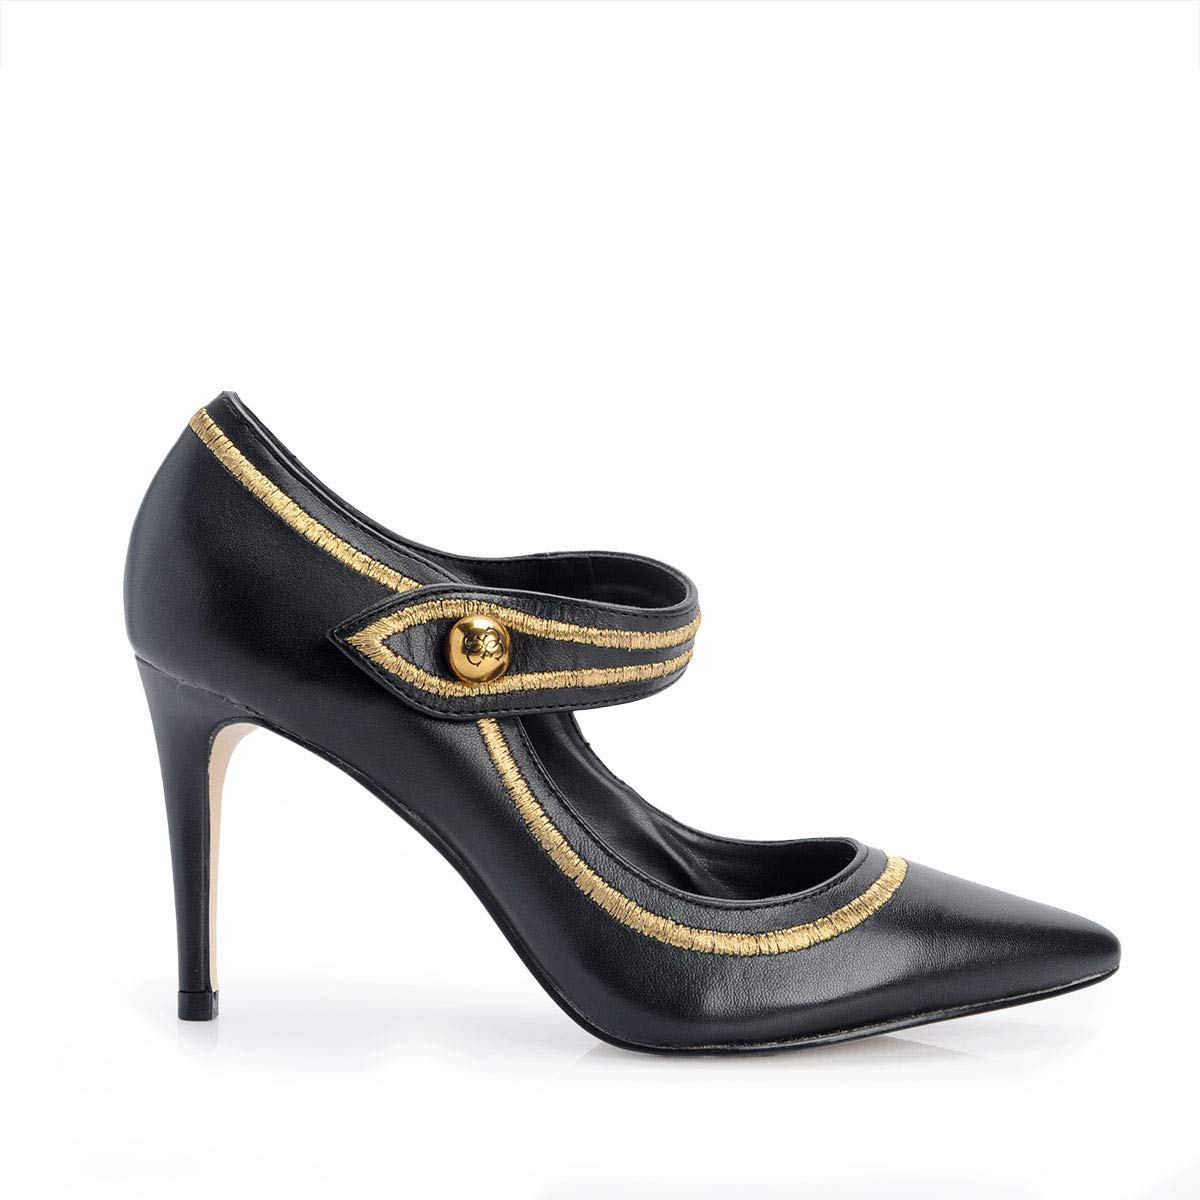 Guess Schuhe Bodie - FLBOD3 LEM08 / Bodie - Größe: 37(EU) -